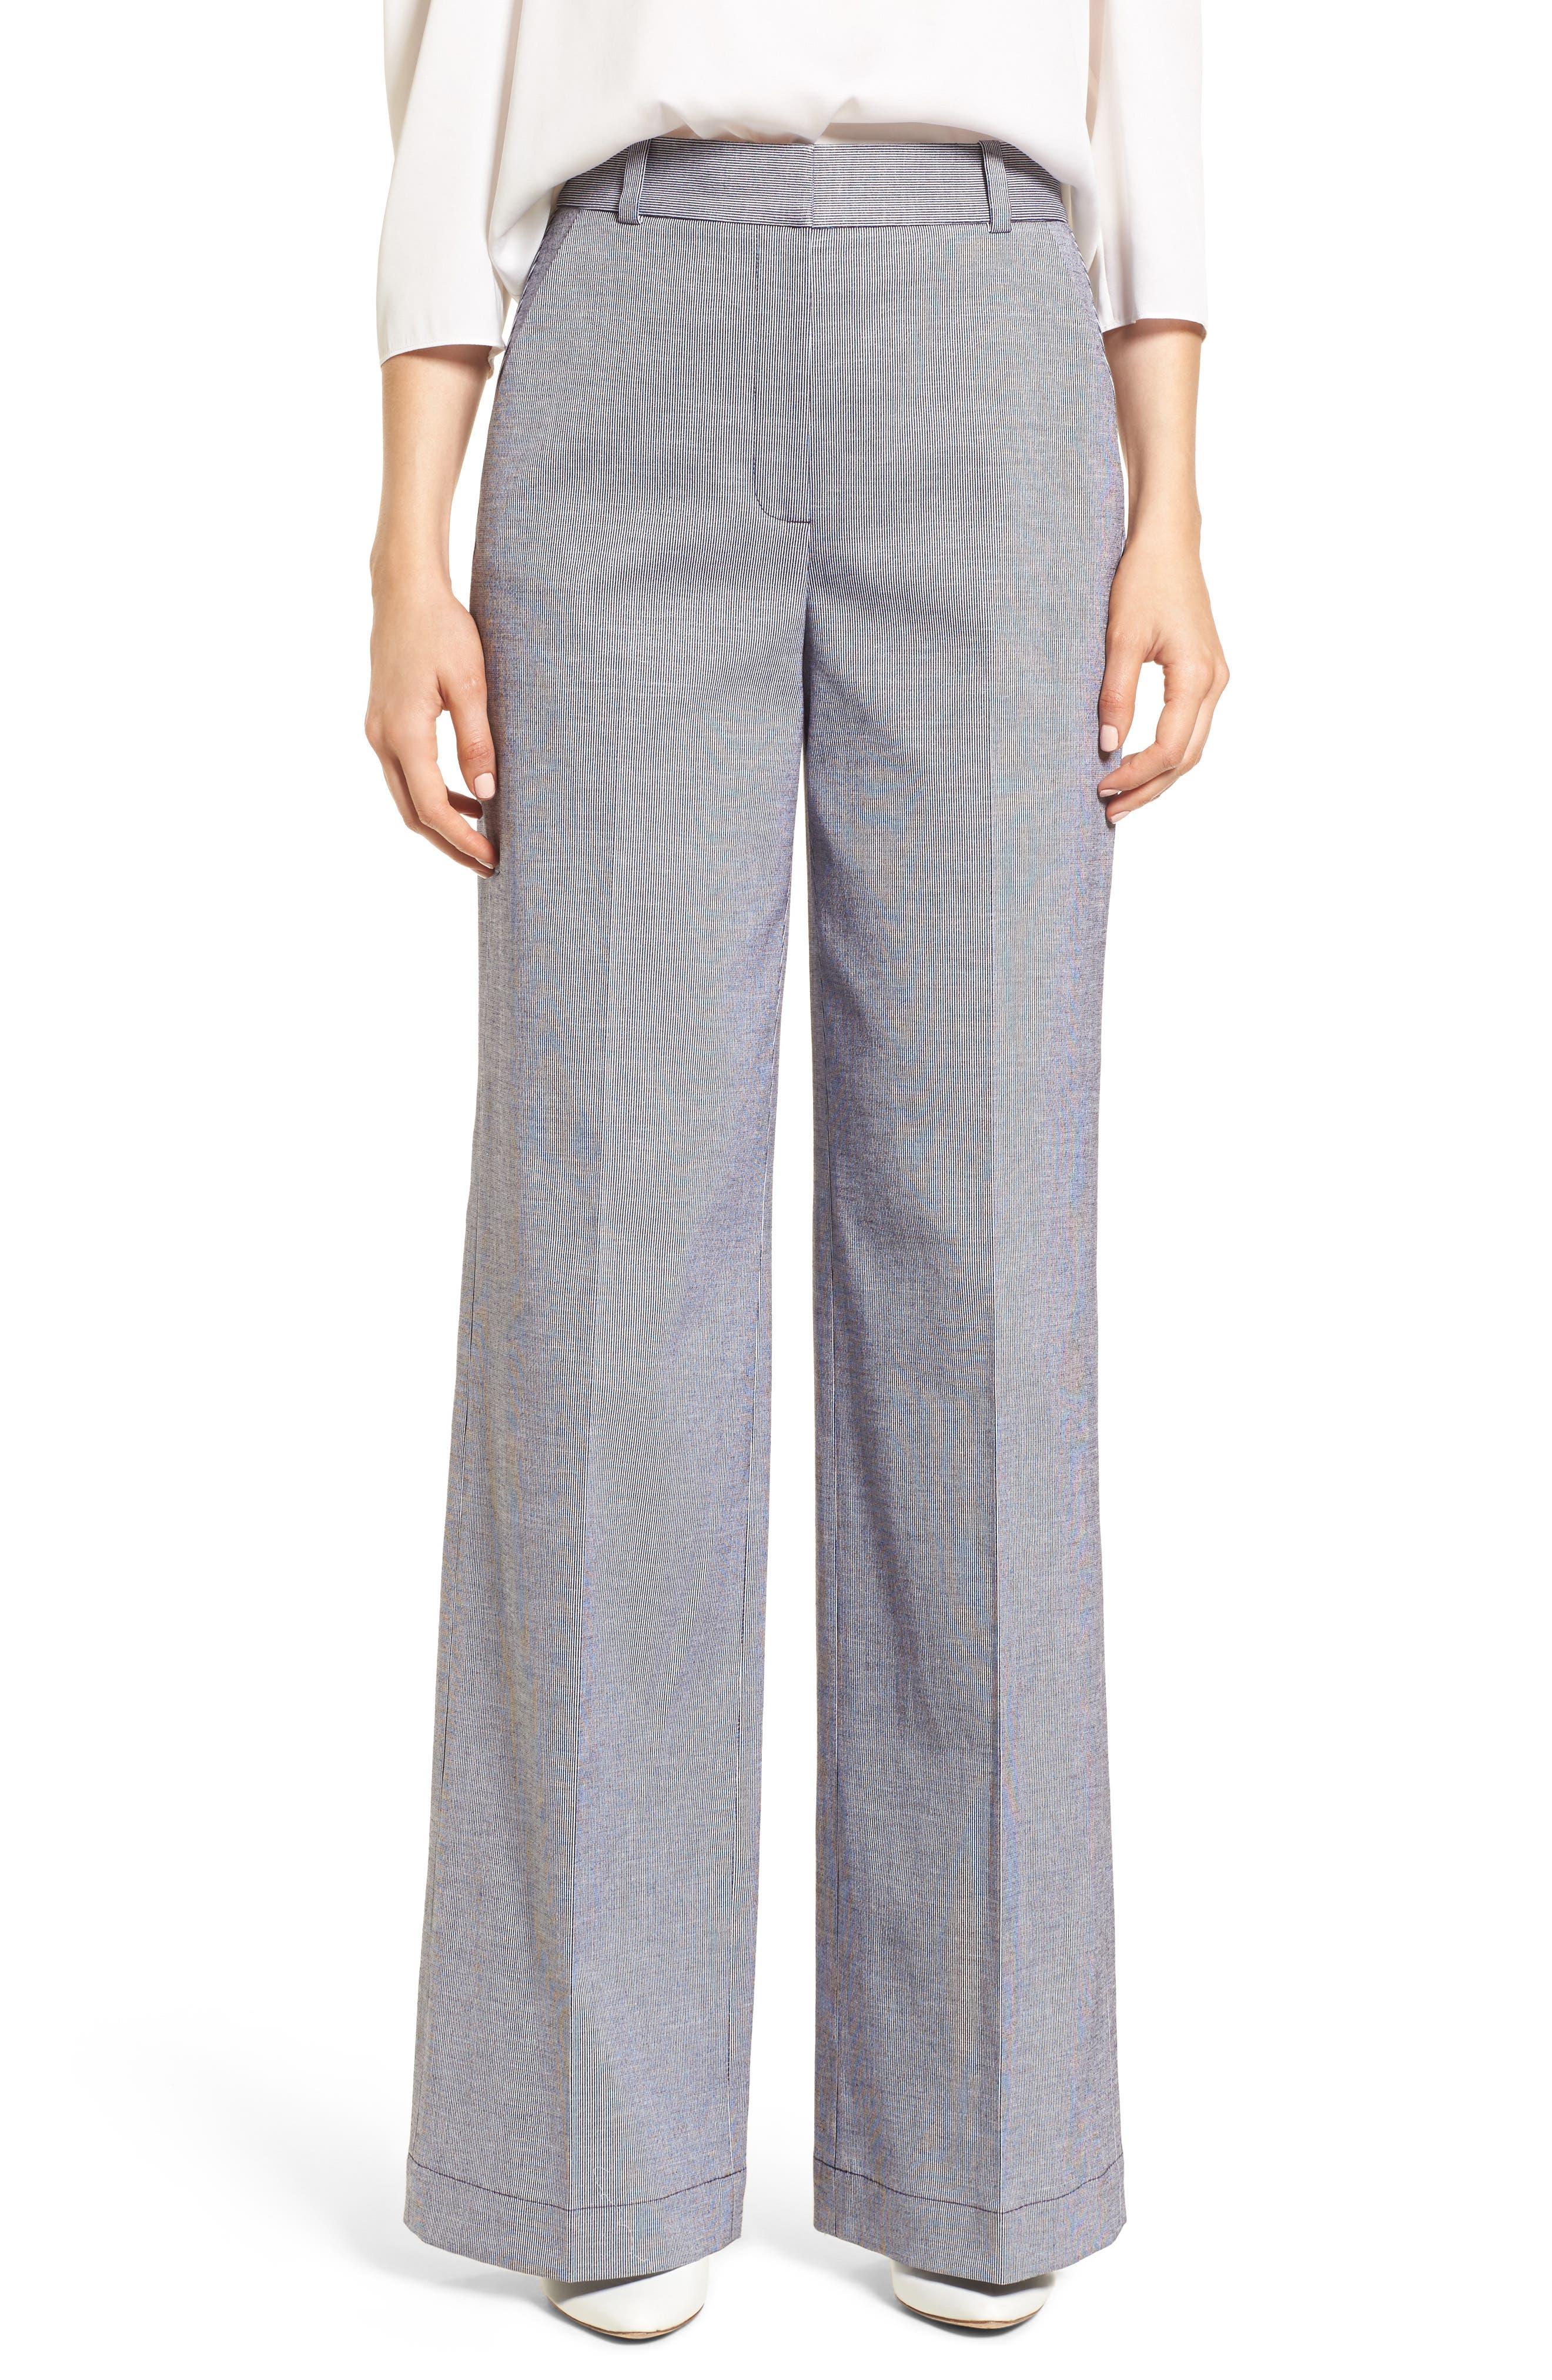 Ticking Stripe Pants,                         Main,                         color, Navy Night- White Stripe